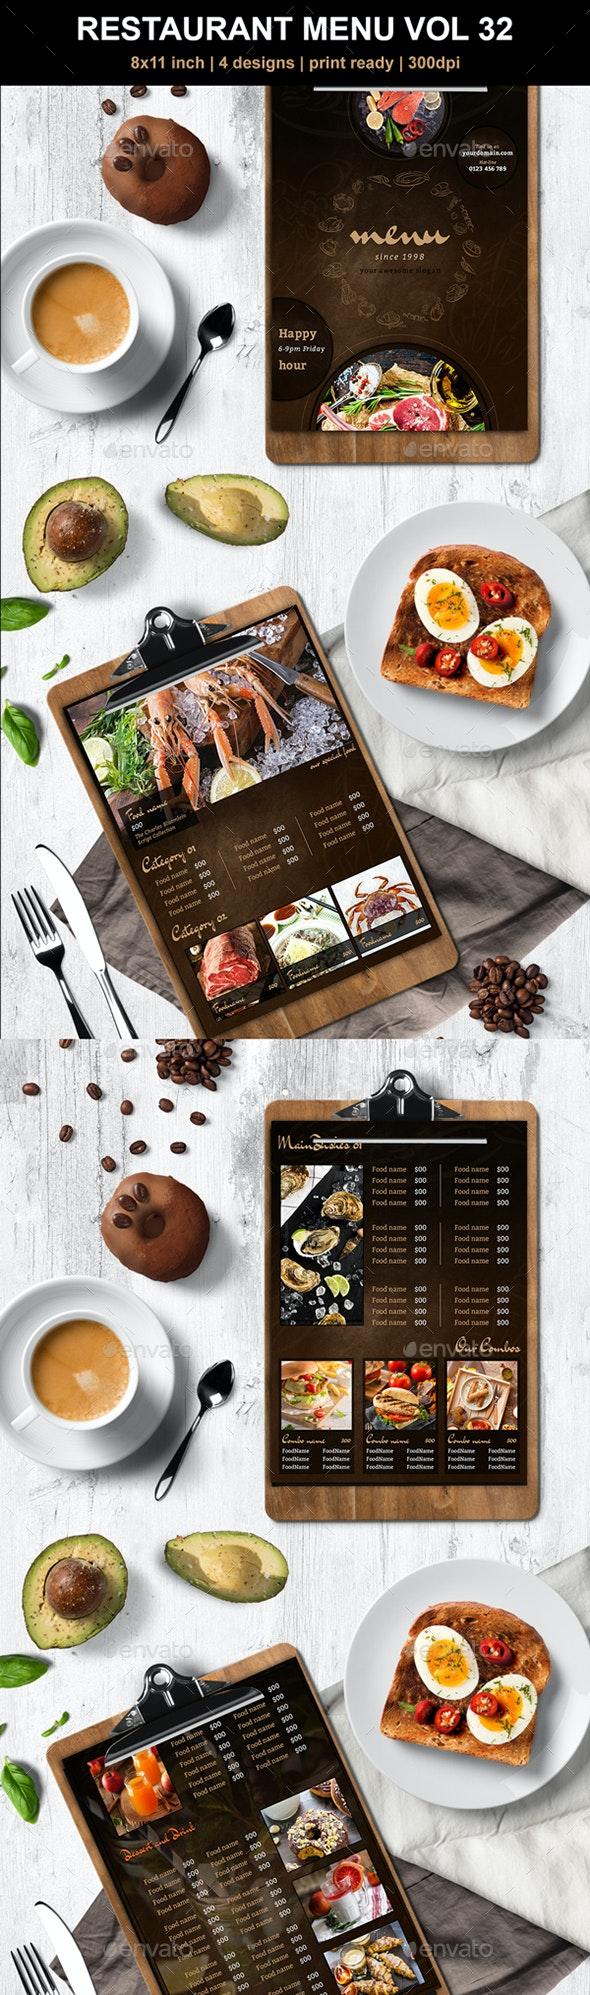 Restaurant Menu Vol 32 - Food Menus Print Templates